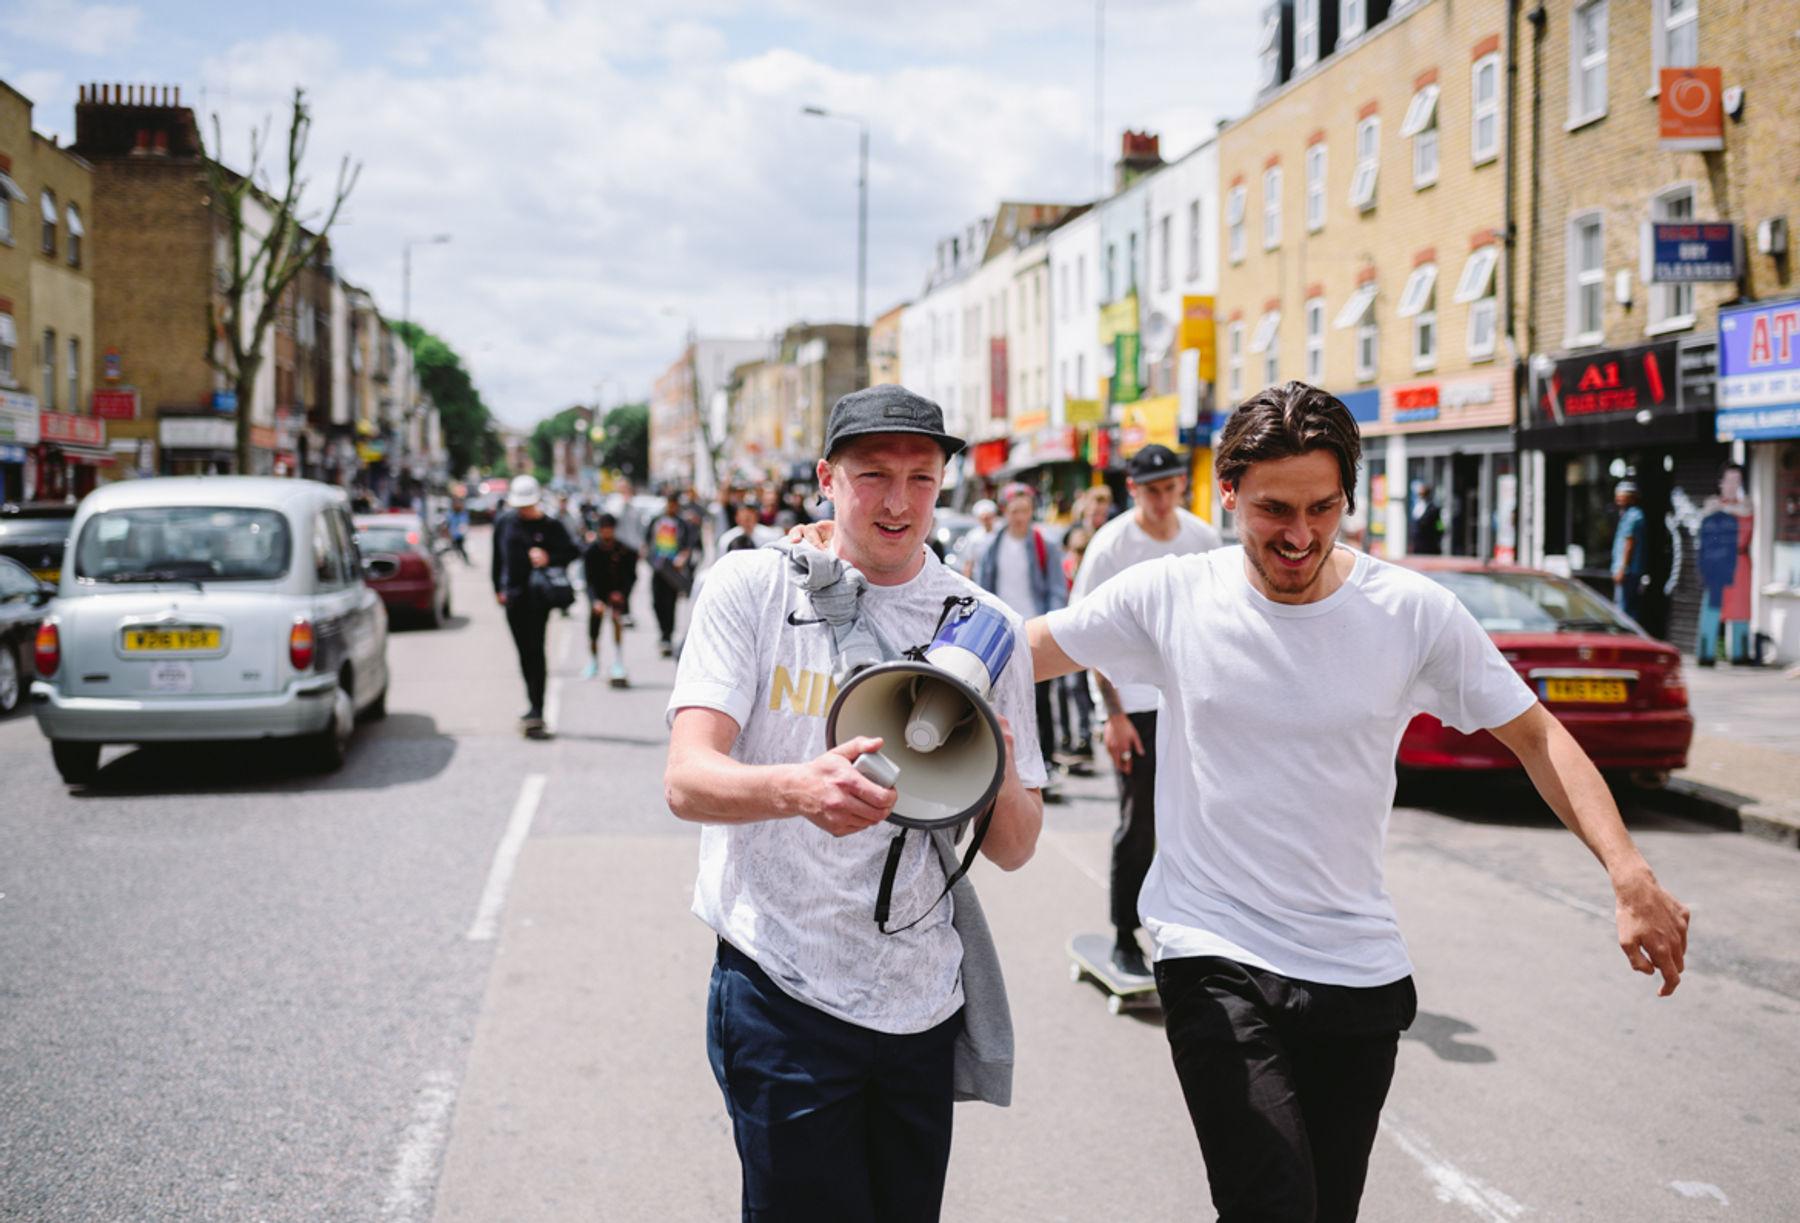 _IHC7353e-Neil-Smith-Tom-Harrison-Nike-SB-x-Slam-City-Skates-Go-Skateboarding-Day-London-June-2015-Photographer-Maksim-Kalanep